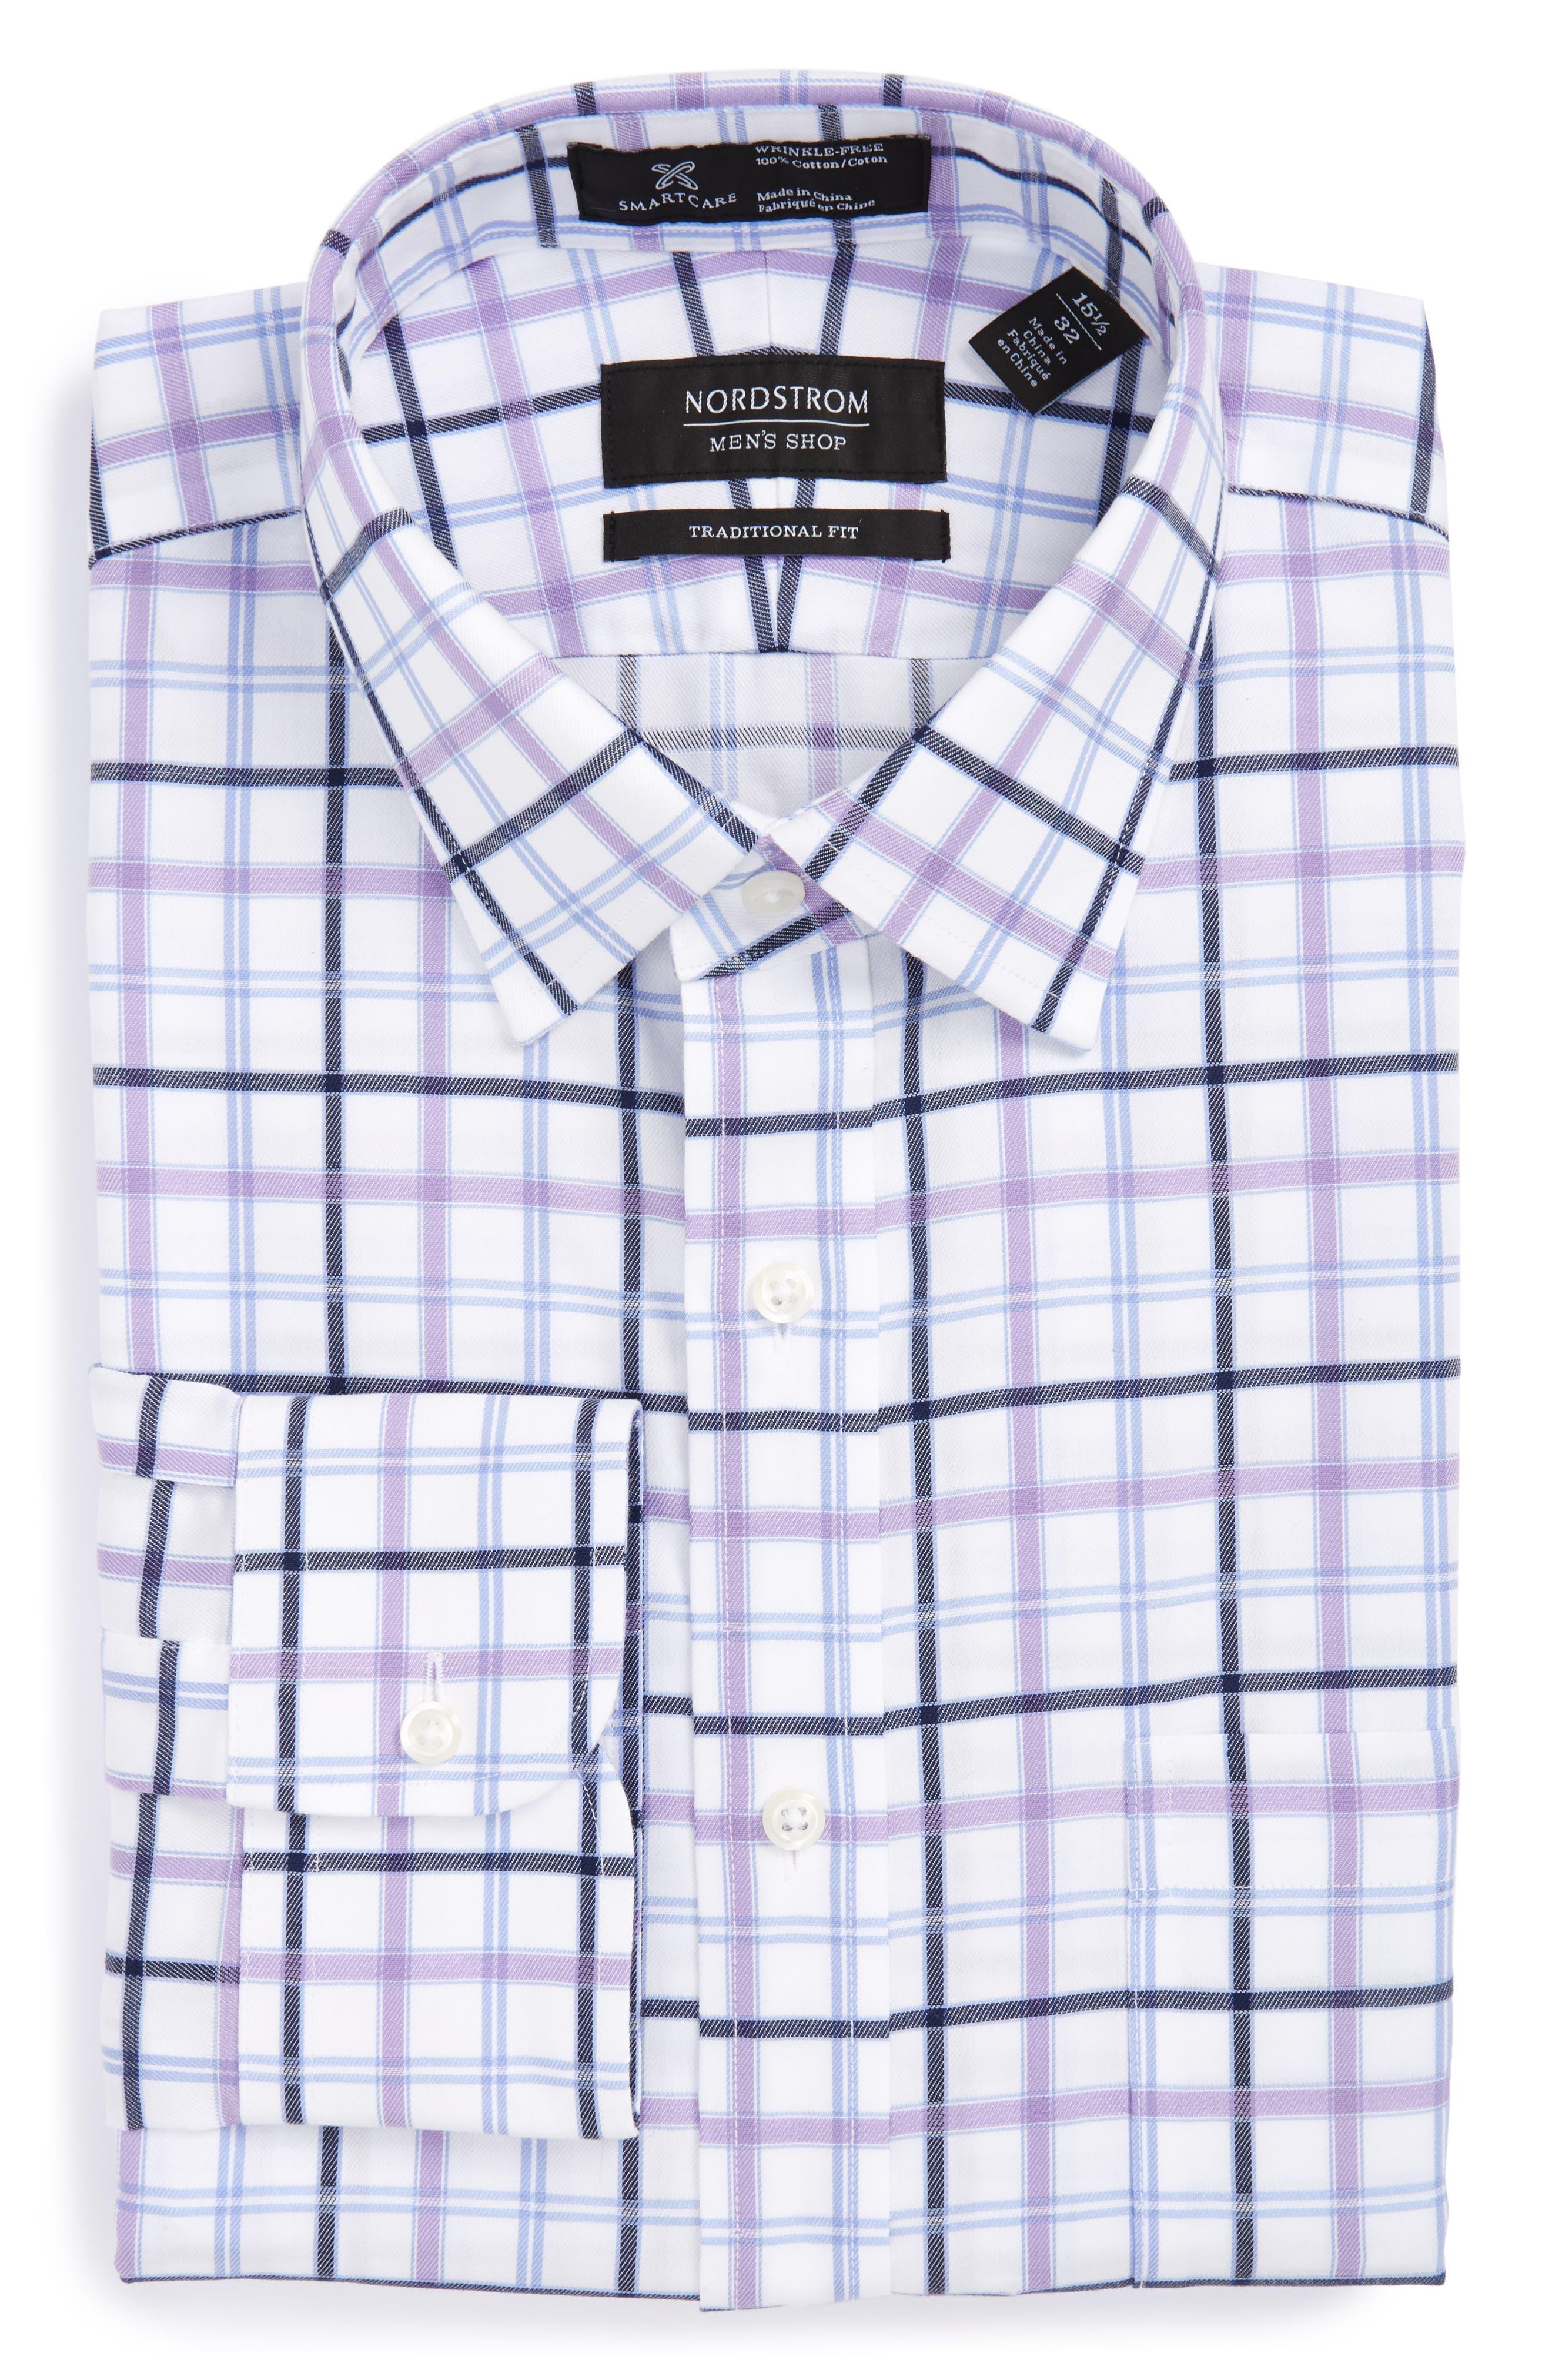 Alternate Image 1 Selected - Nordstrom Men's Shop Smartcare™ Traditional Fit Check Dress Shirt